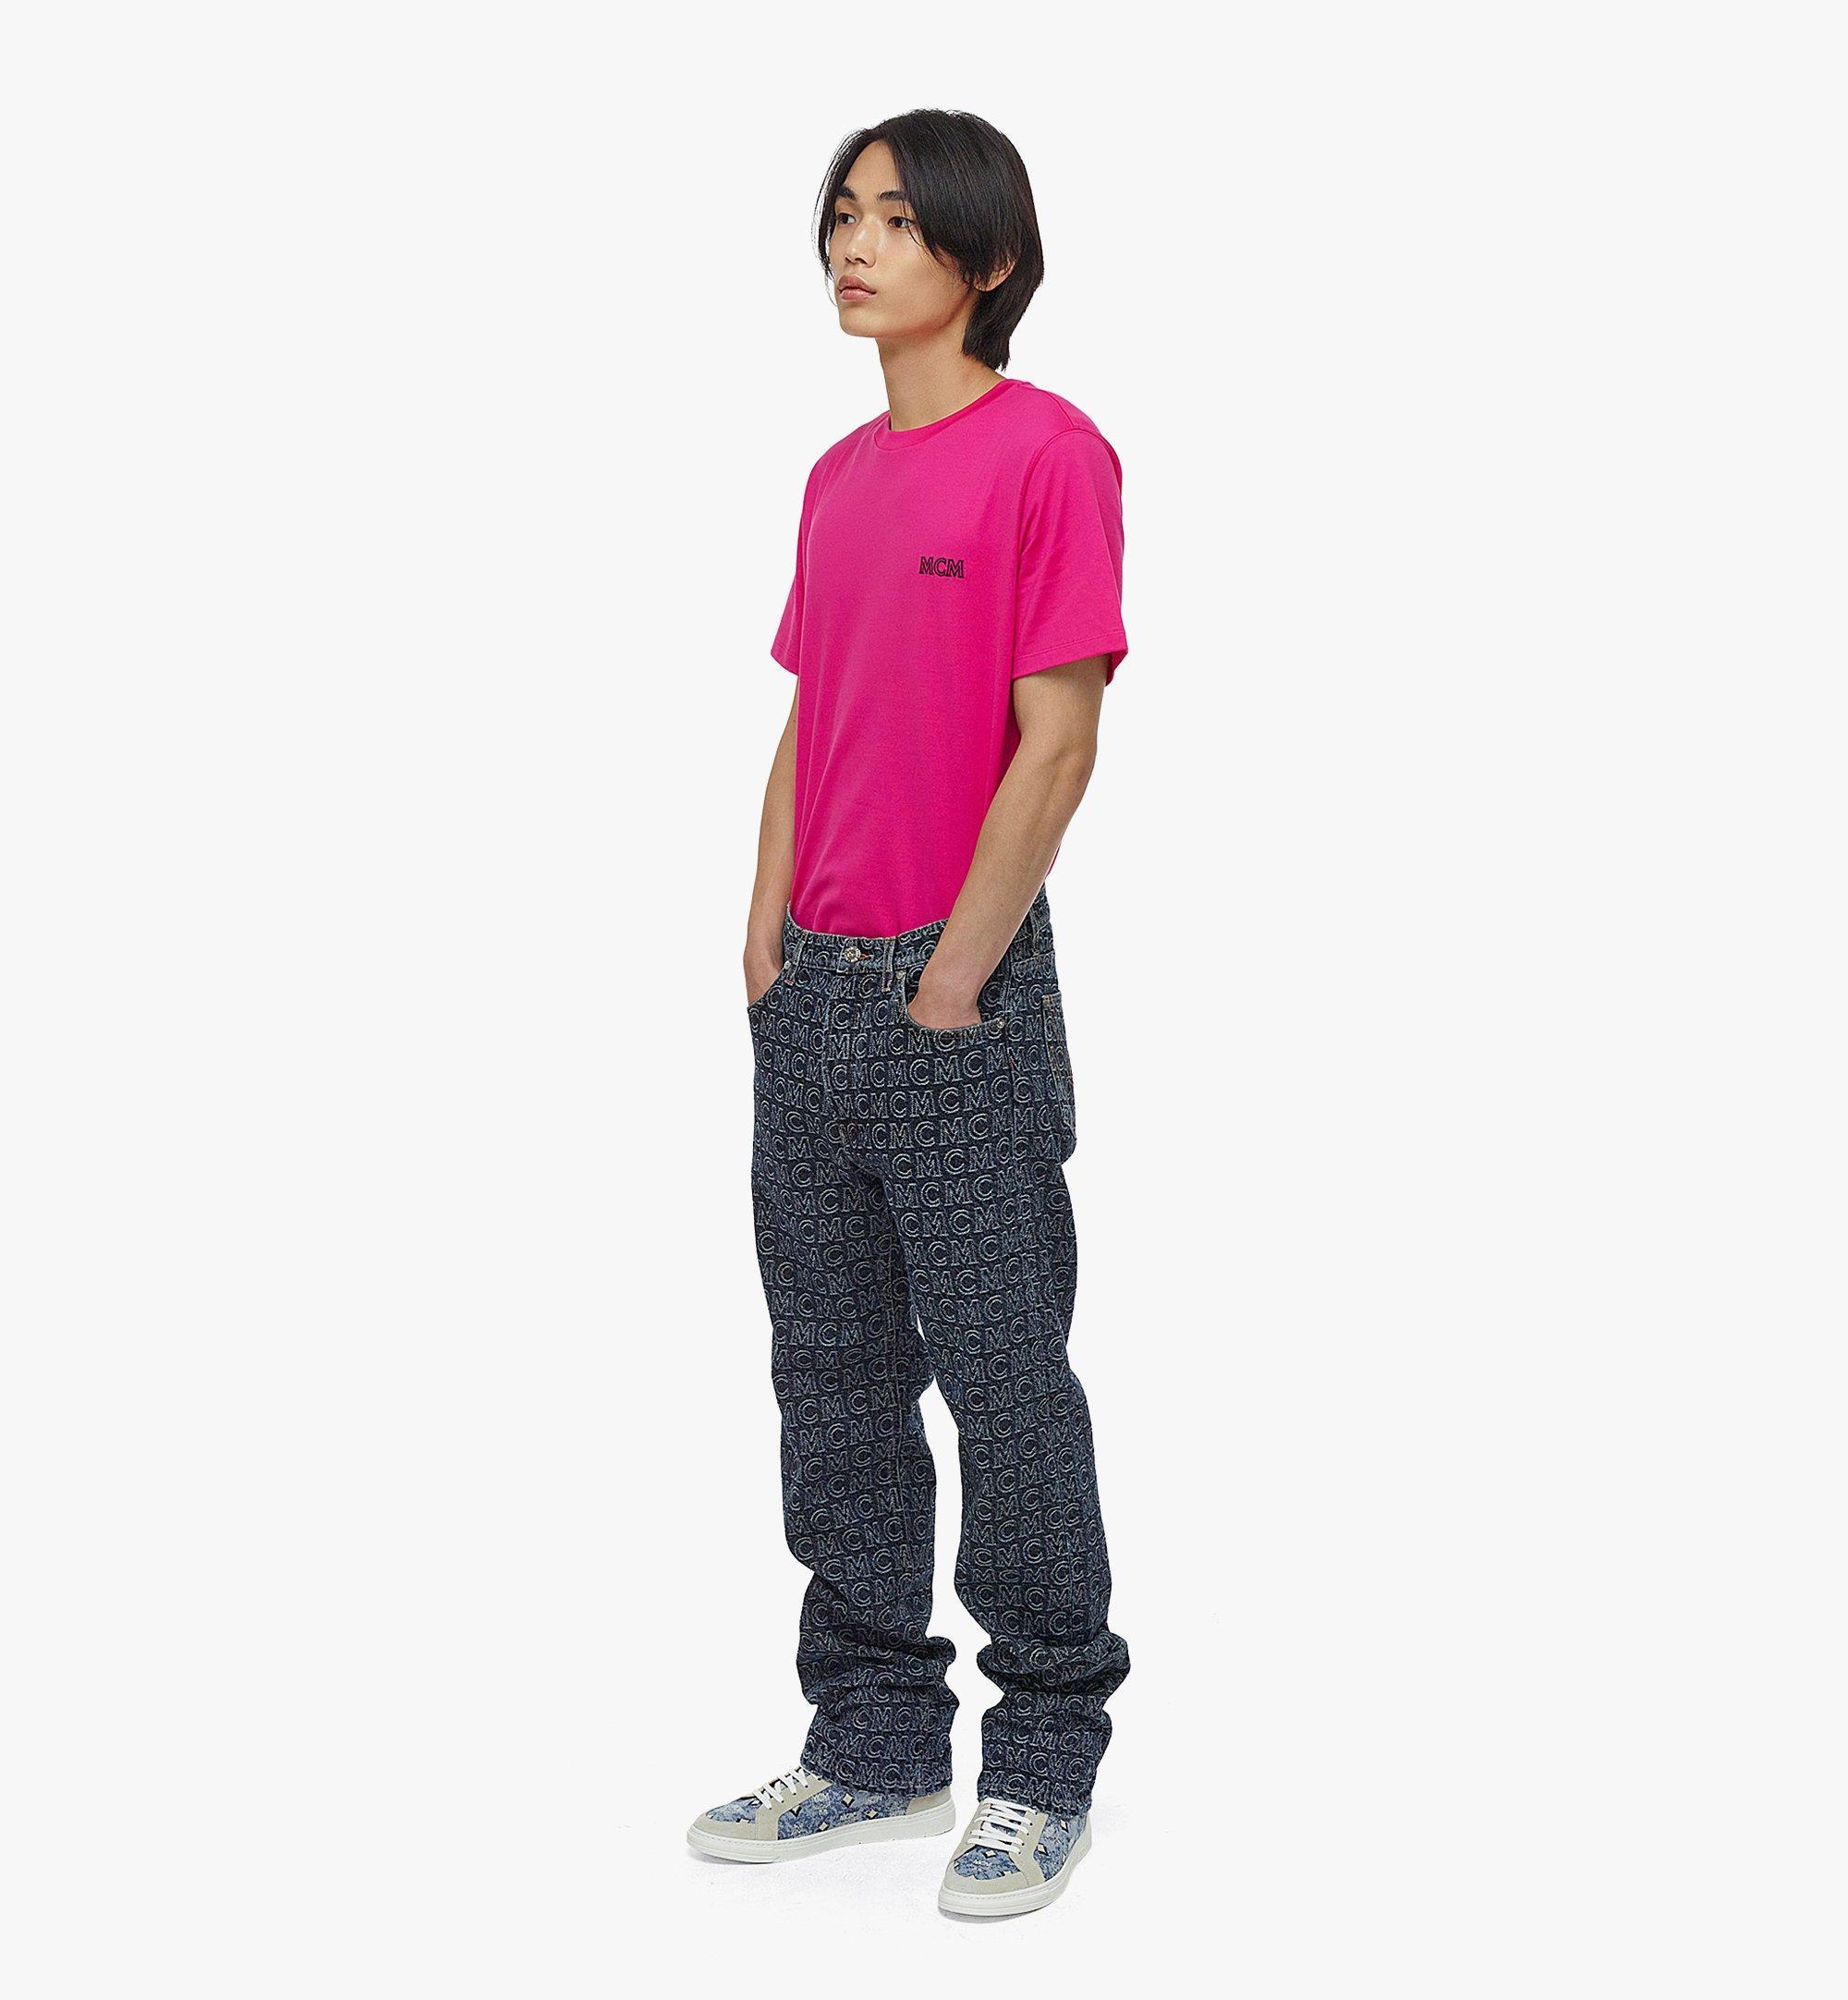 MCM Men's Monogram Straight Leg Jeans Black MHPAADS01VW050 Alternate View 3